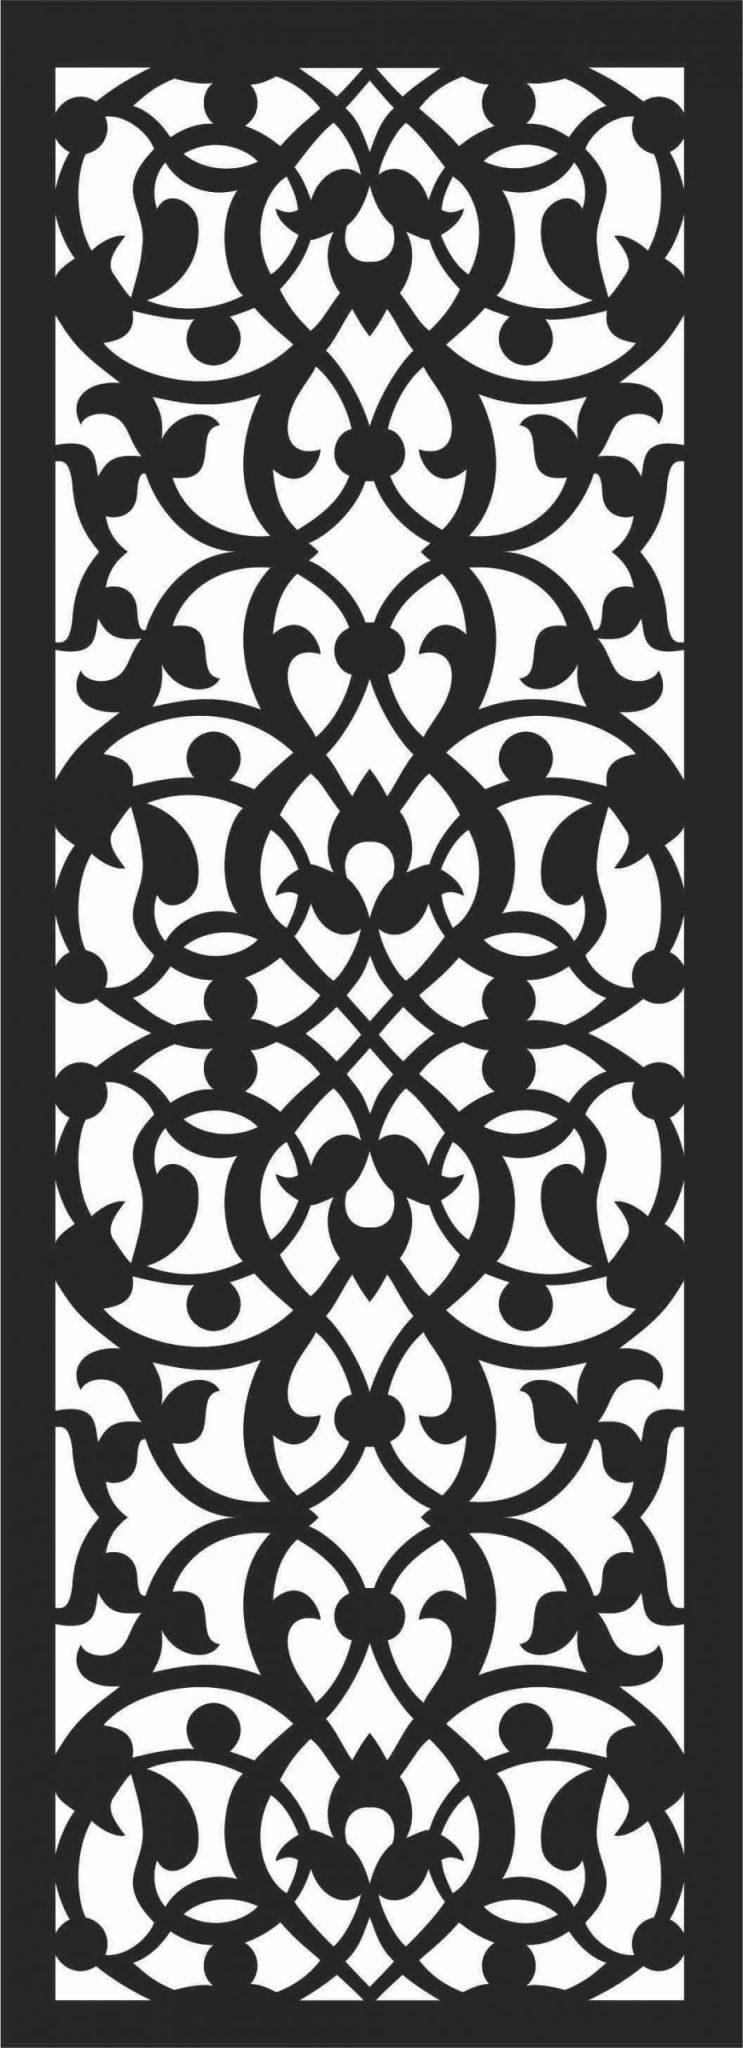 Screen Panel Patterns Seamless 58 Free DXF File